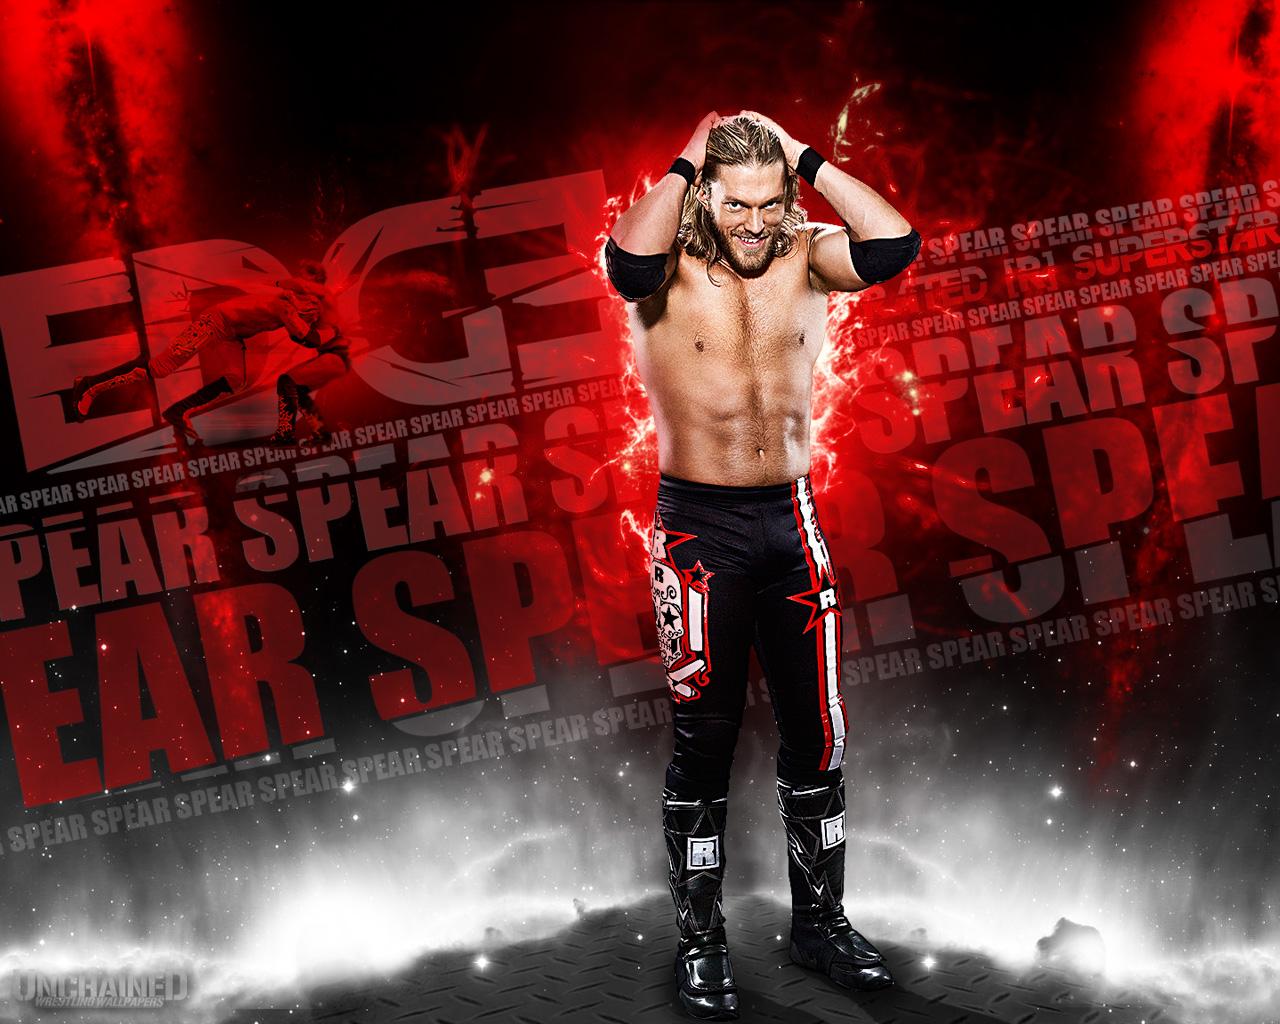 quality Spear Wrestling WWE Wallpaper Num 5 1280 x 1024 4549 Kb 1280x1024